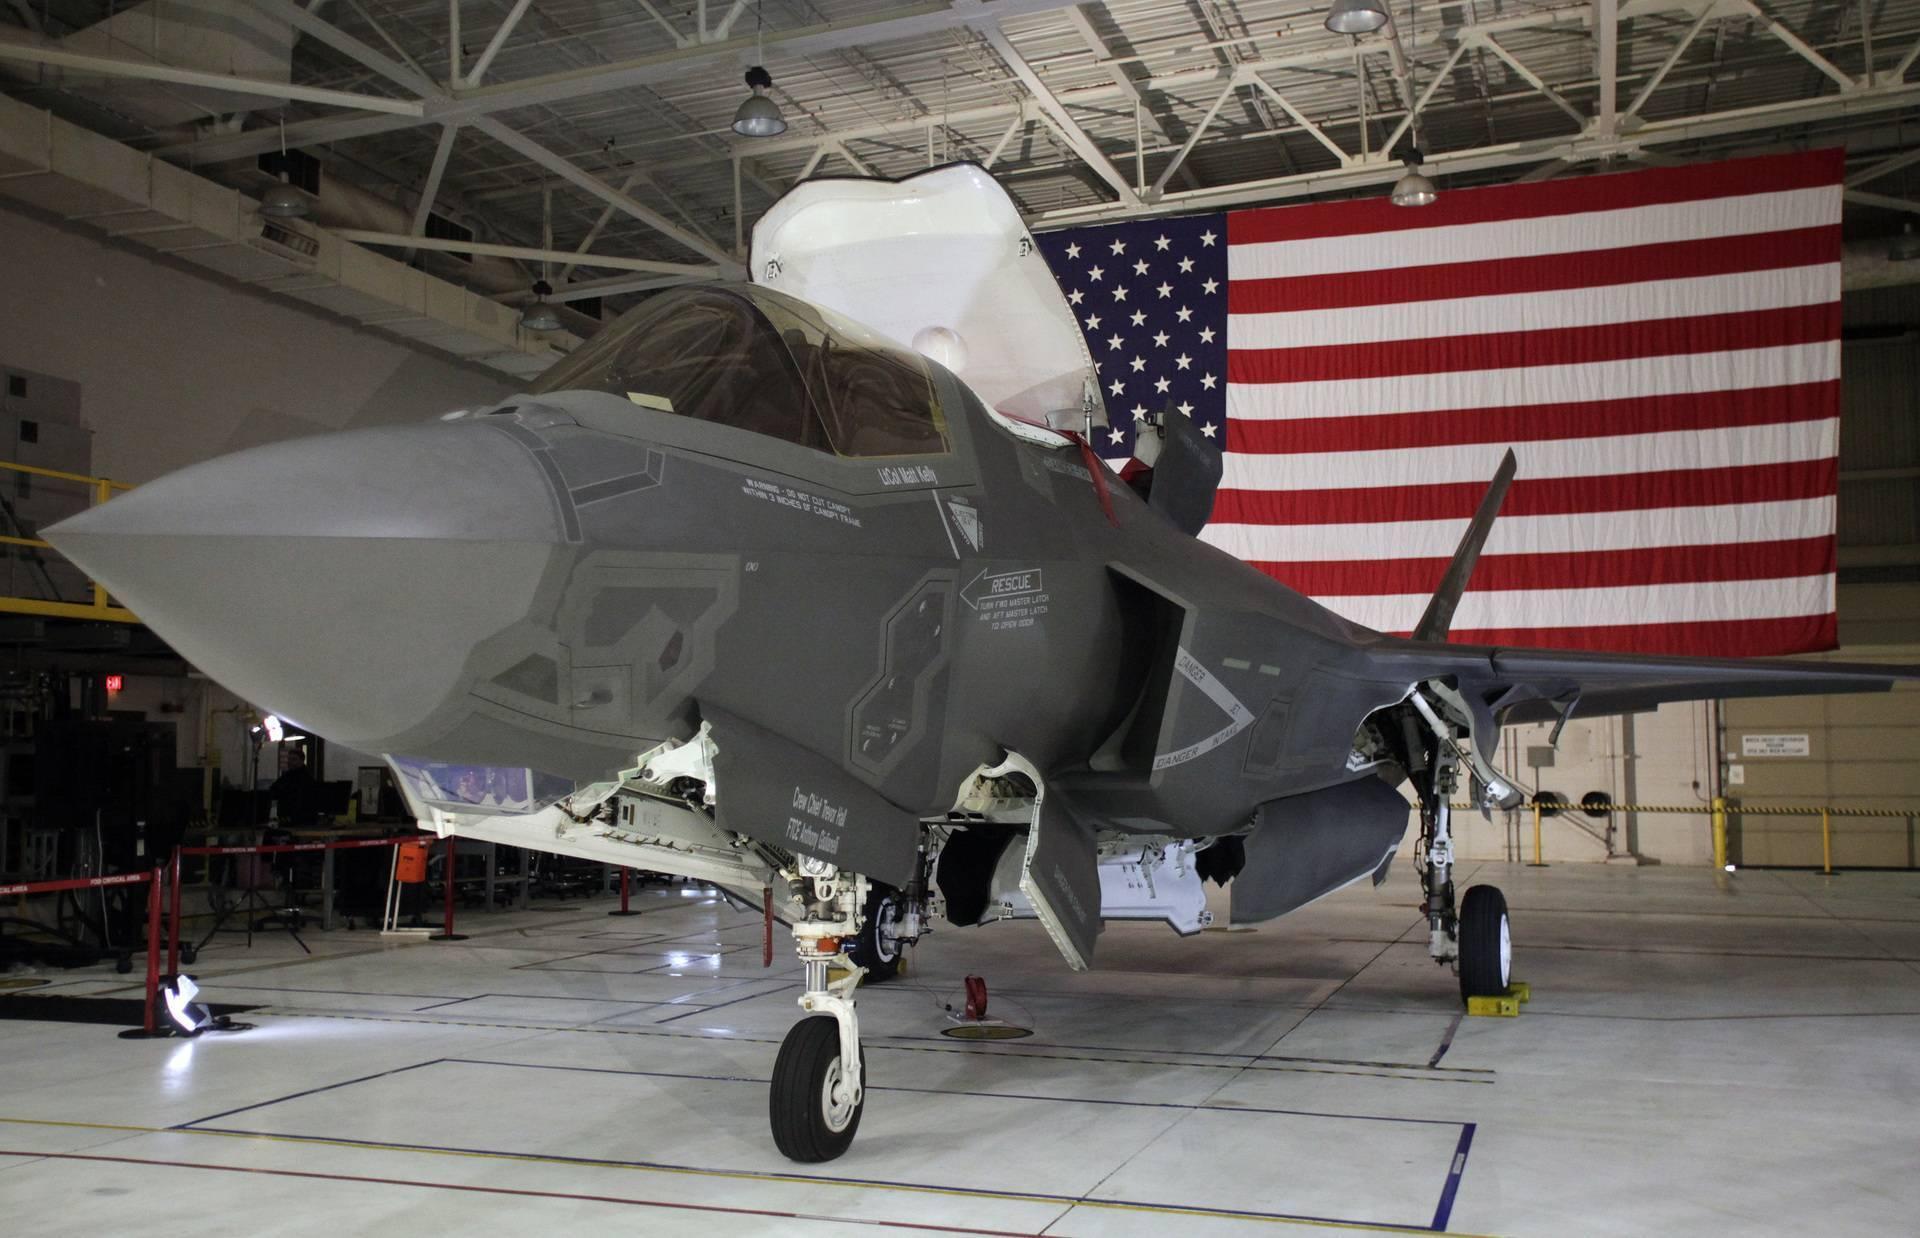 Истребитель lockheed martin f-35a lightning ii